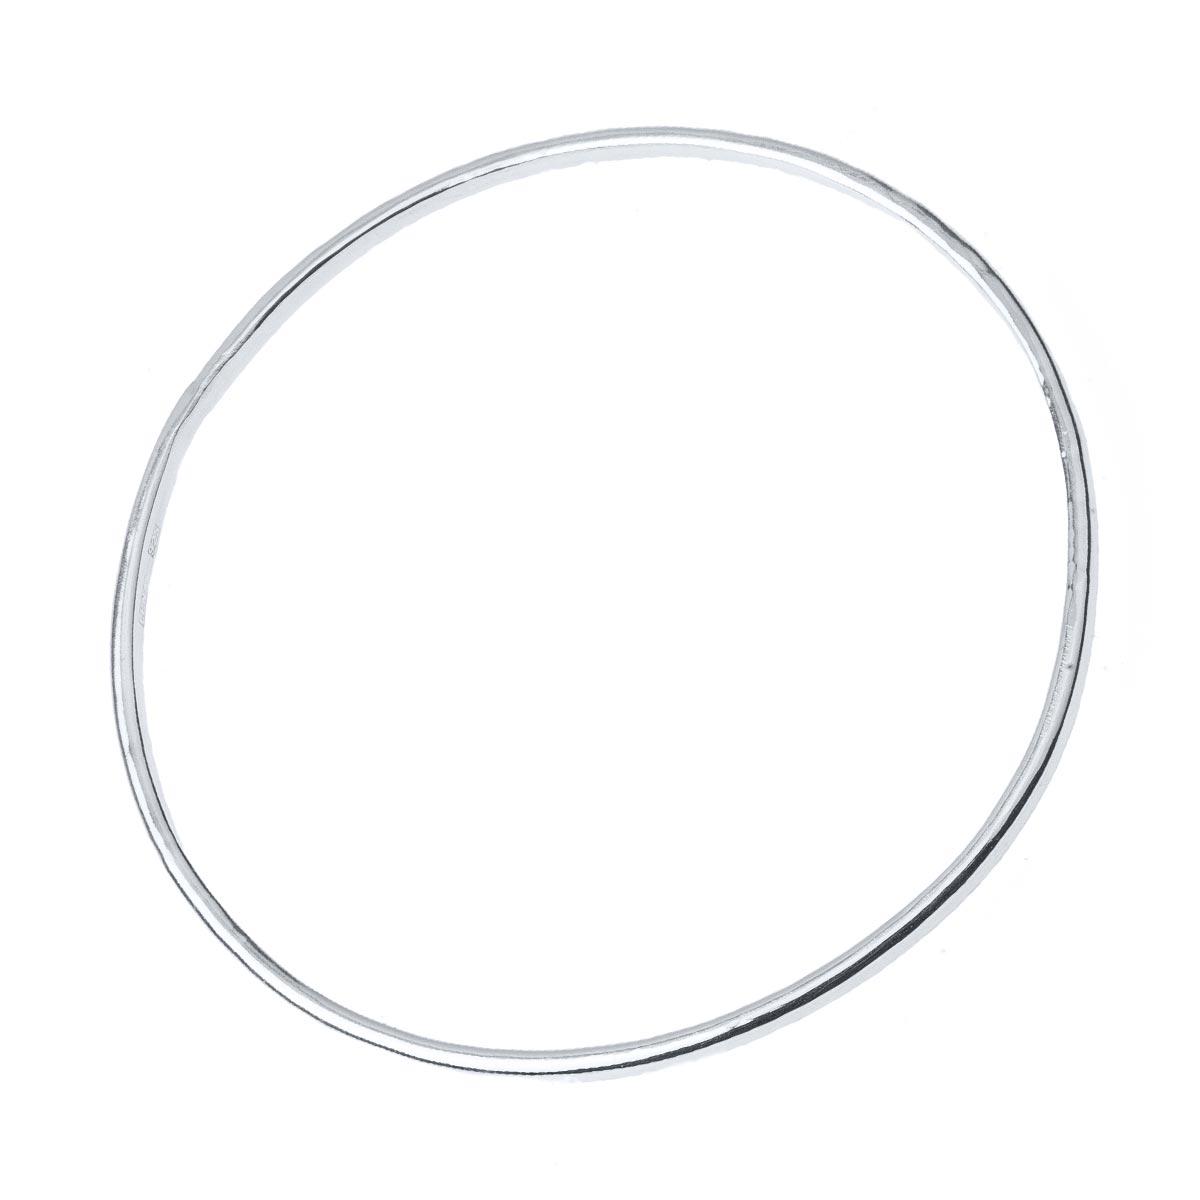 Design Lena W – You armband, silver